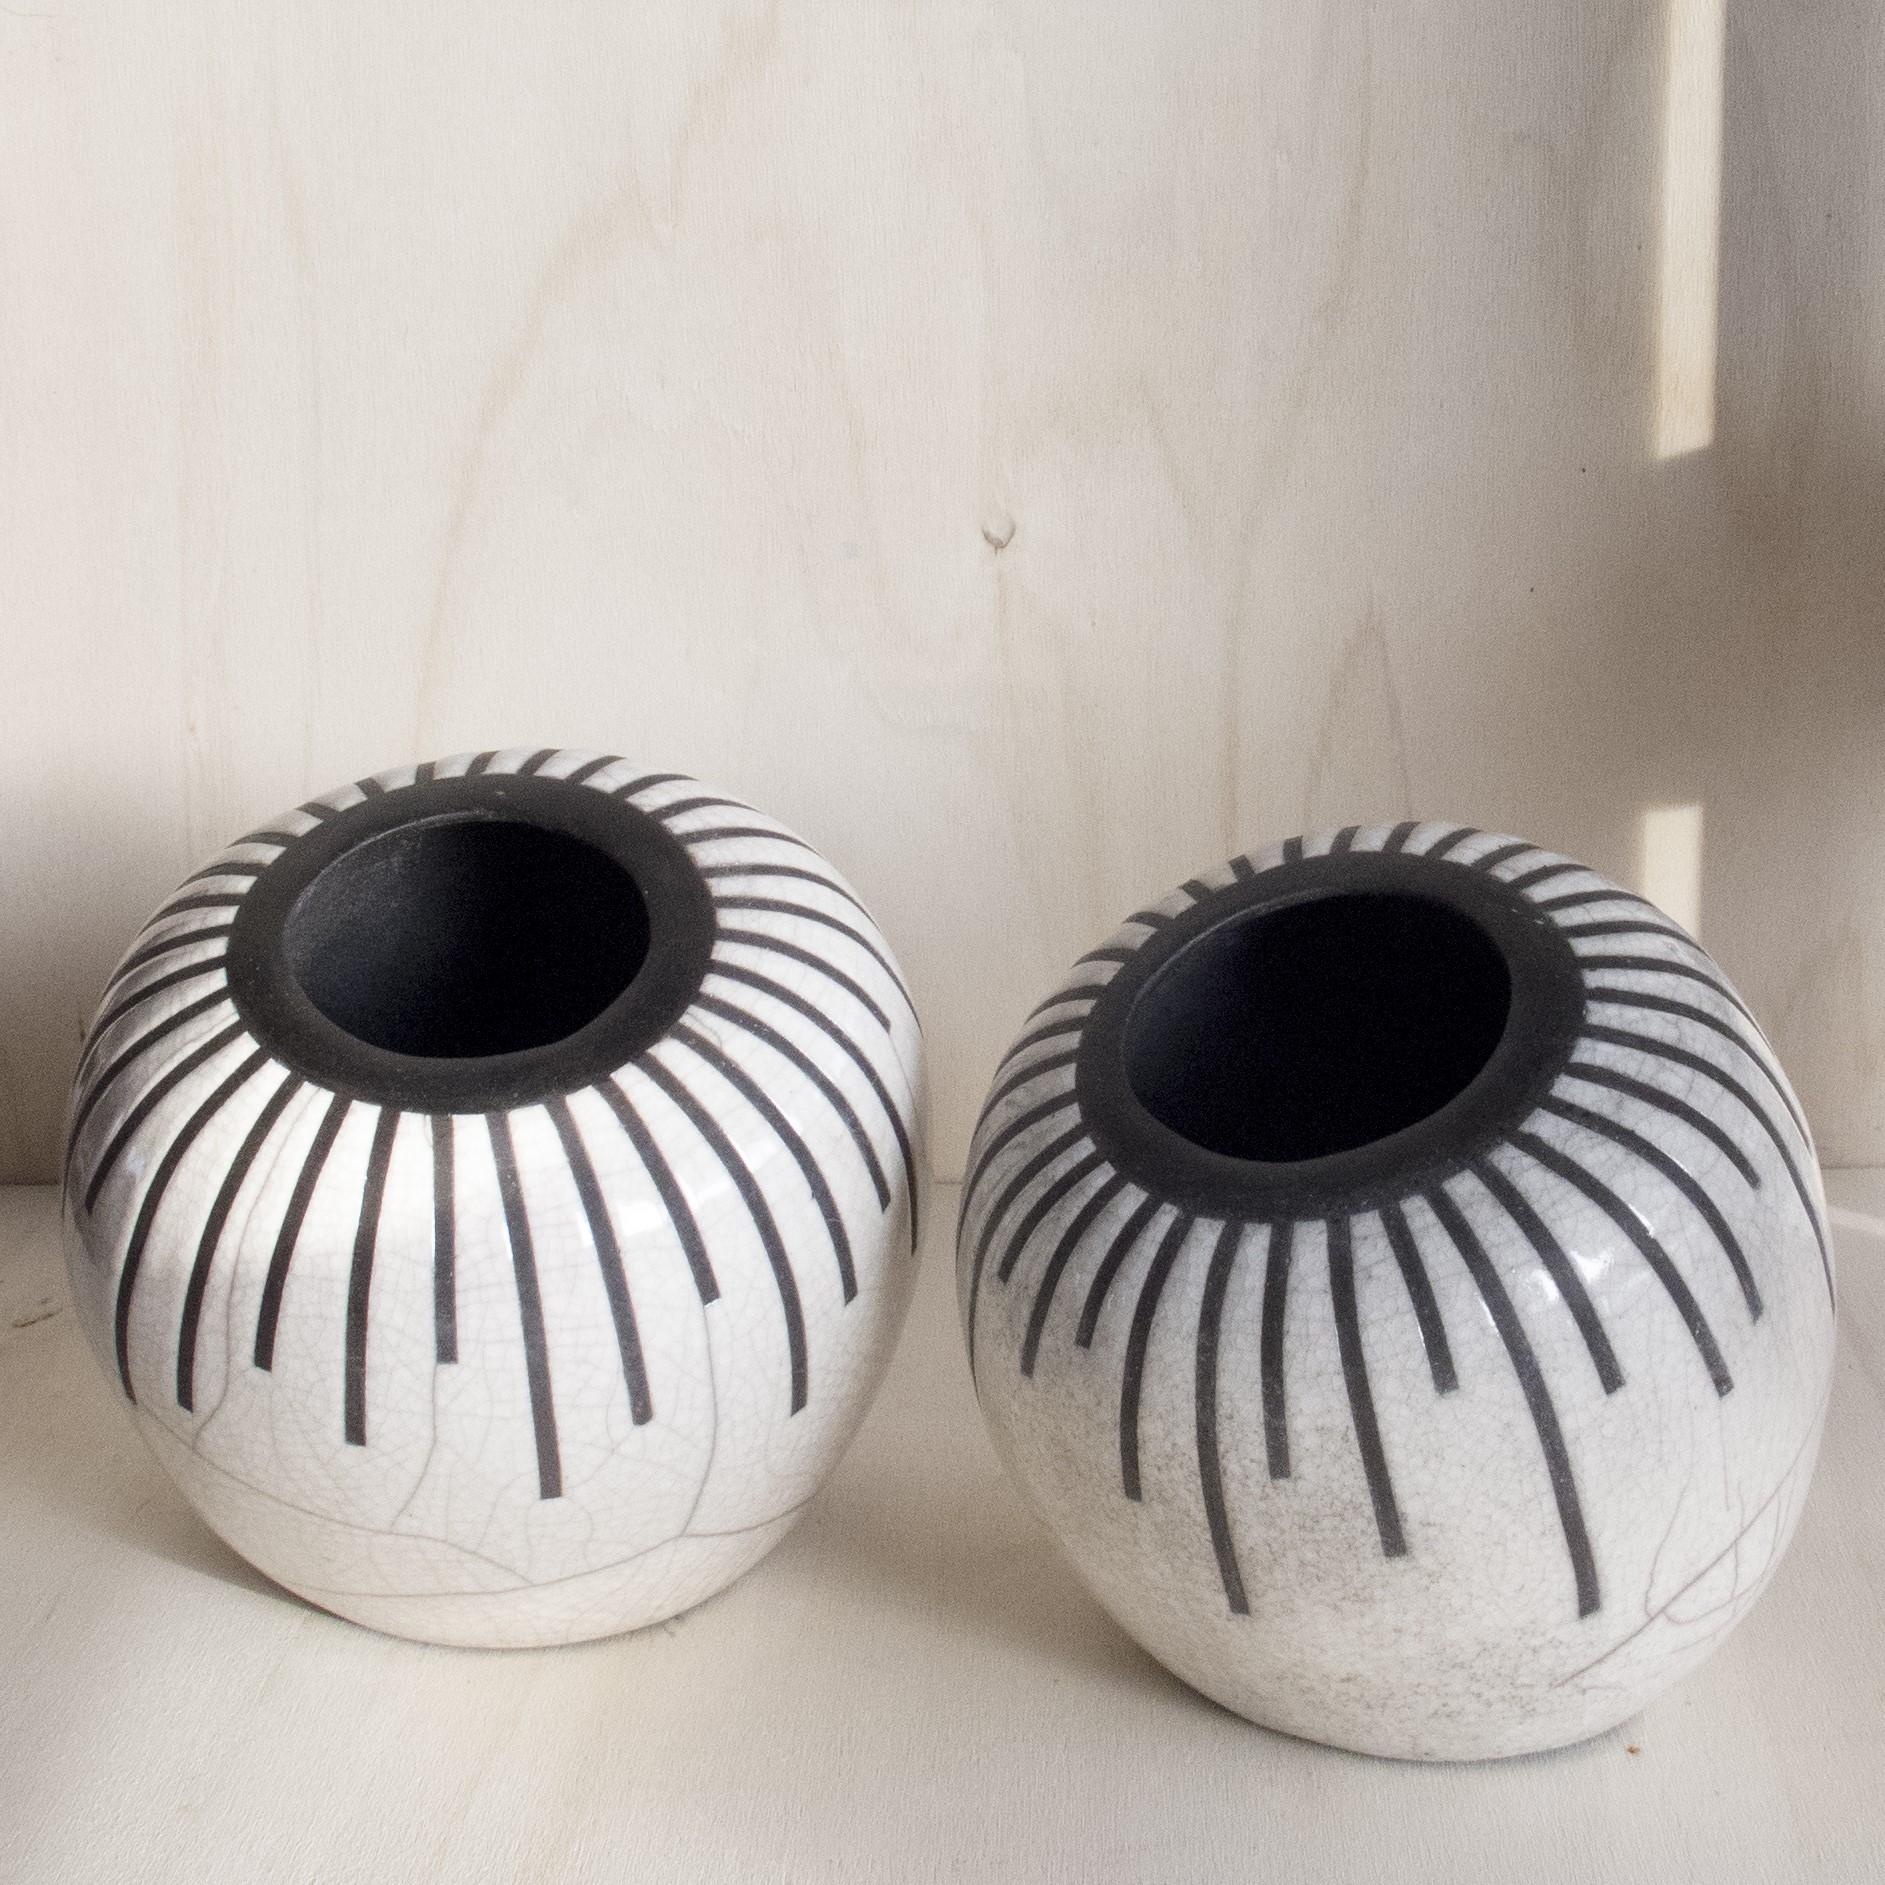 Espositori Festa della Ceramica 2018 - Mancuso Maria Antonietta